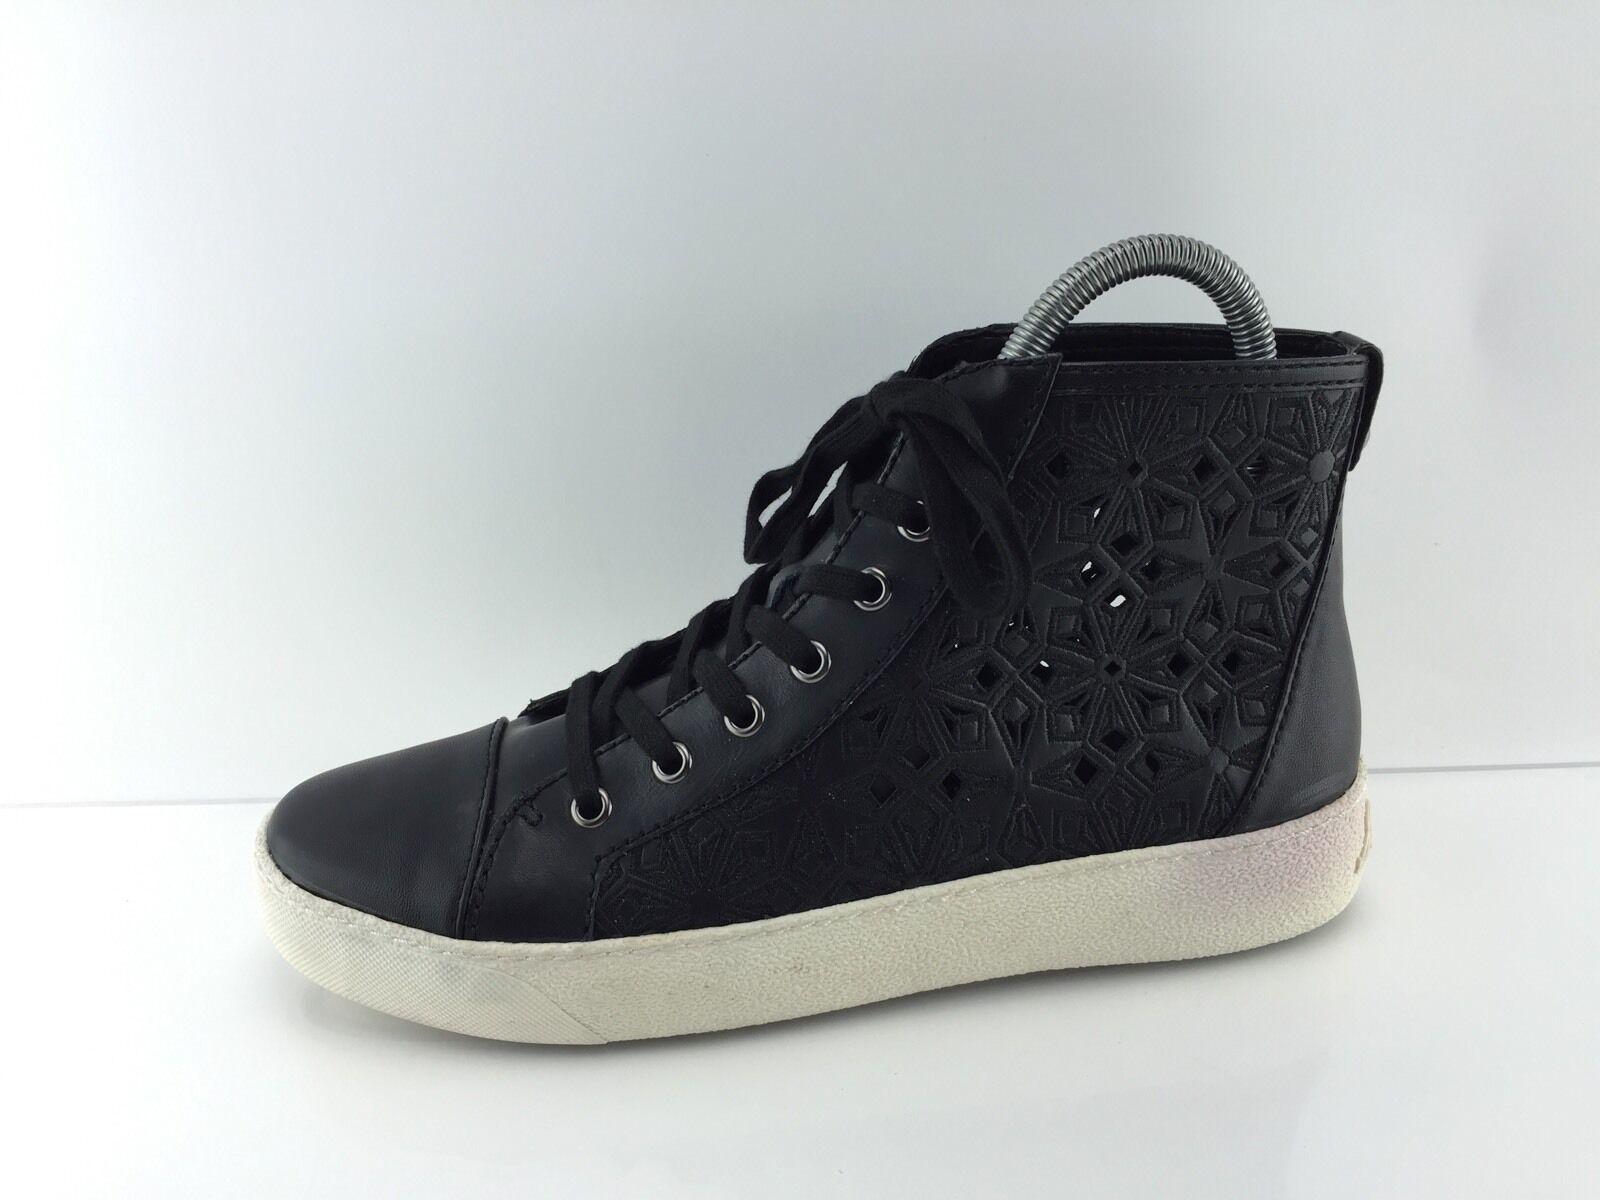 Sam Edelman Women's Black To Tops Athletic Boots  9.5 M